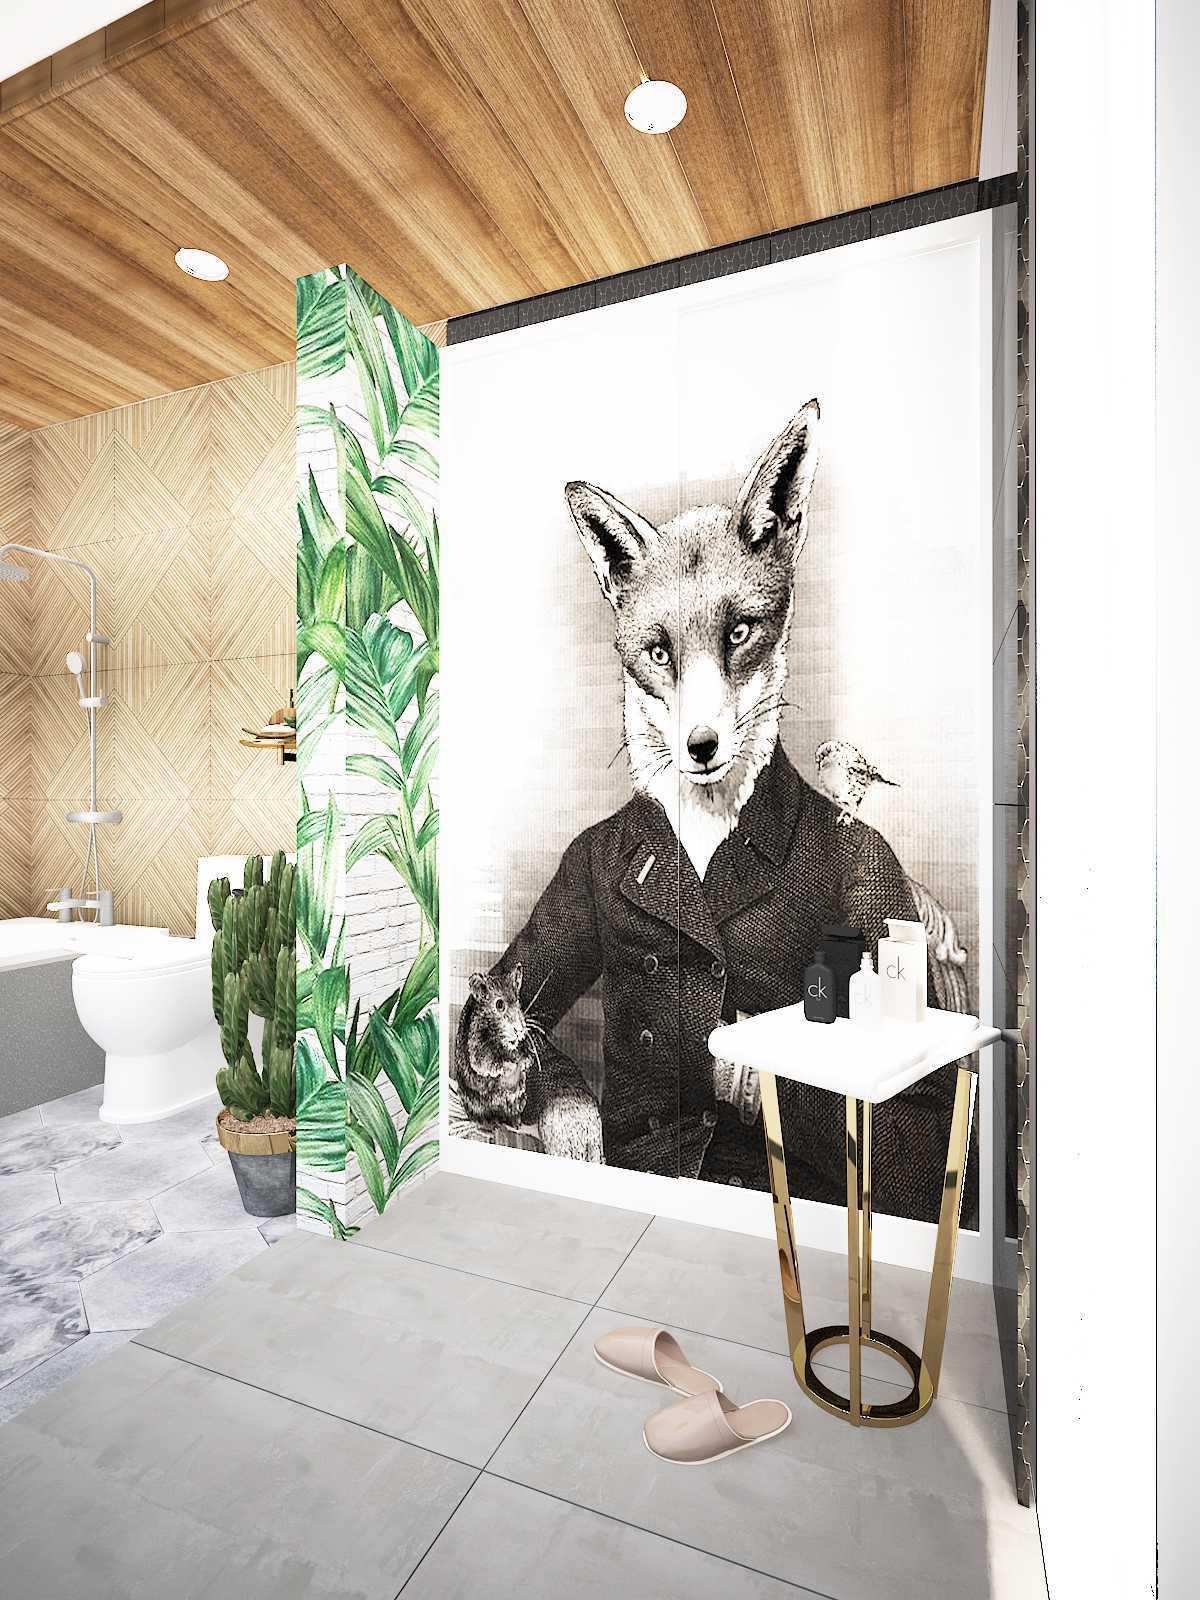 "Arianiz Studio Mr. Royan Bathroom Bukit Sari Jl. Ki Mangunsarkoro No.16, Karangkidul, Kec. Semarang Tengah, Kota Semarang, Jawa Tengah 50241, Indonesia Jl. Ki Mangunsarkoro No.16, Karangkidul, Kec. Semarang Tengah, Kota Semarang, Jawa Tengah 50241, Indonesia Arianiz-Studio-Man-Bathroom  <P>R - ""man"" Bathroom</p> <P>Luas Area : 10 M2</p> 119943"